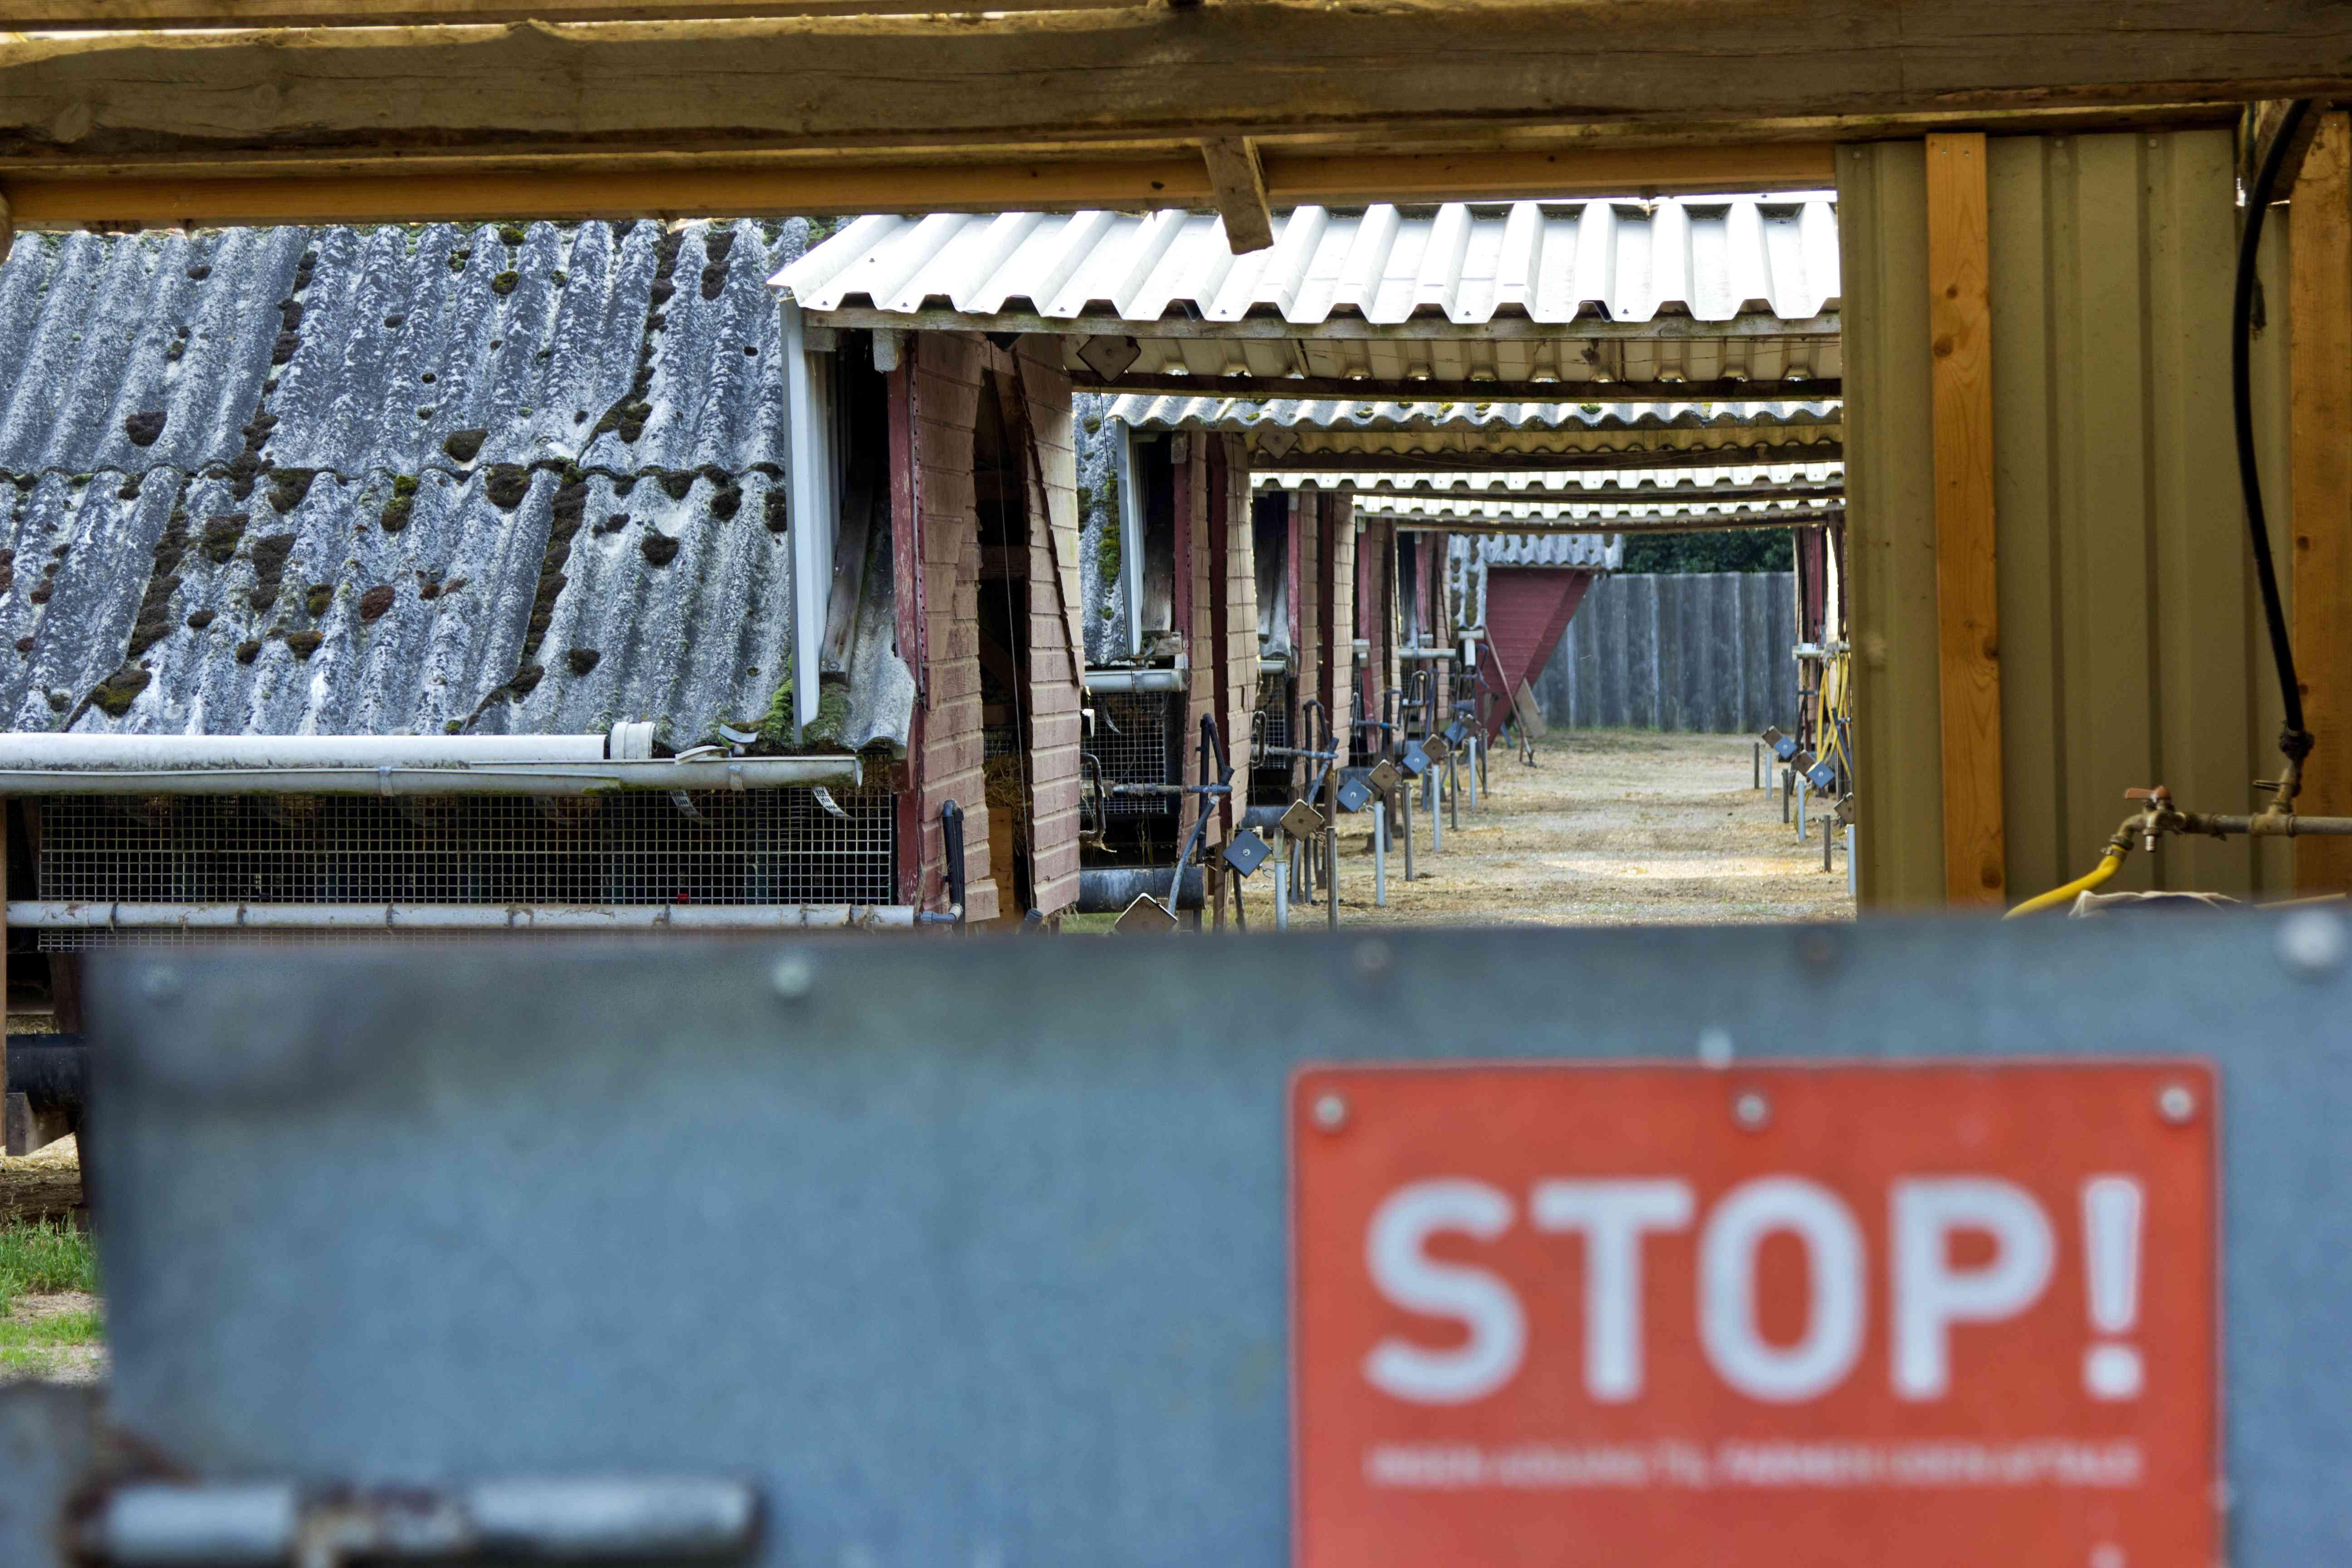 Mink breeding farm exterior